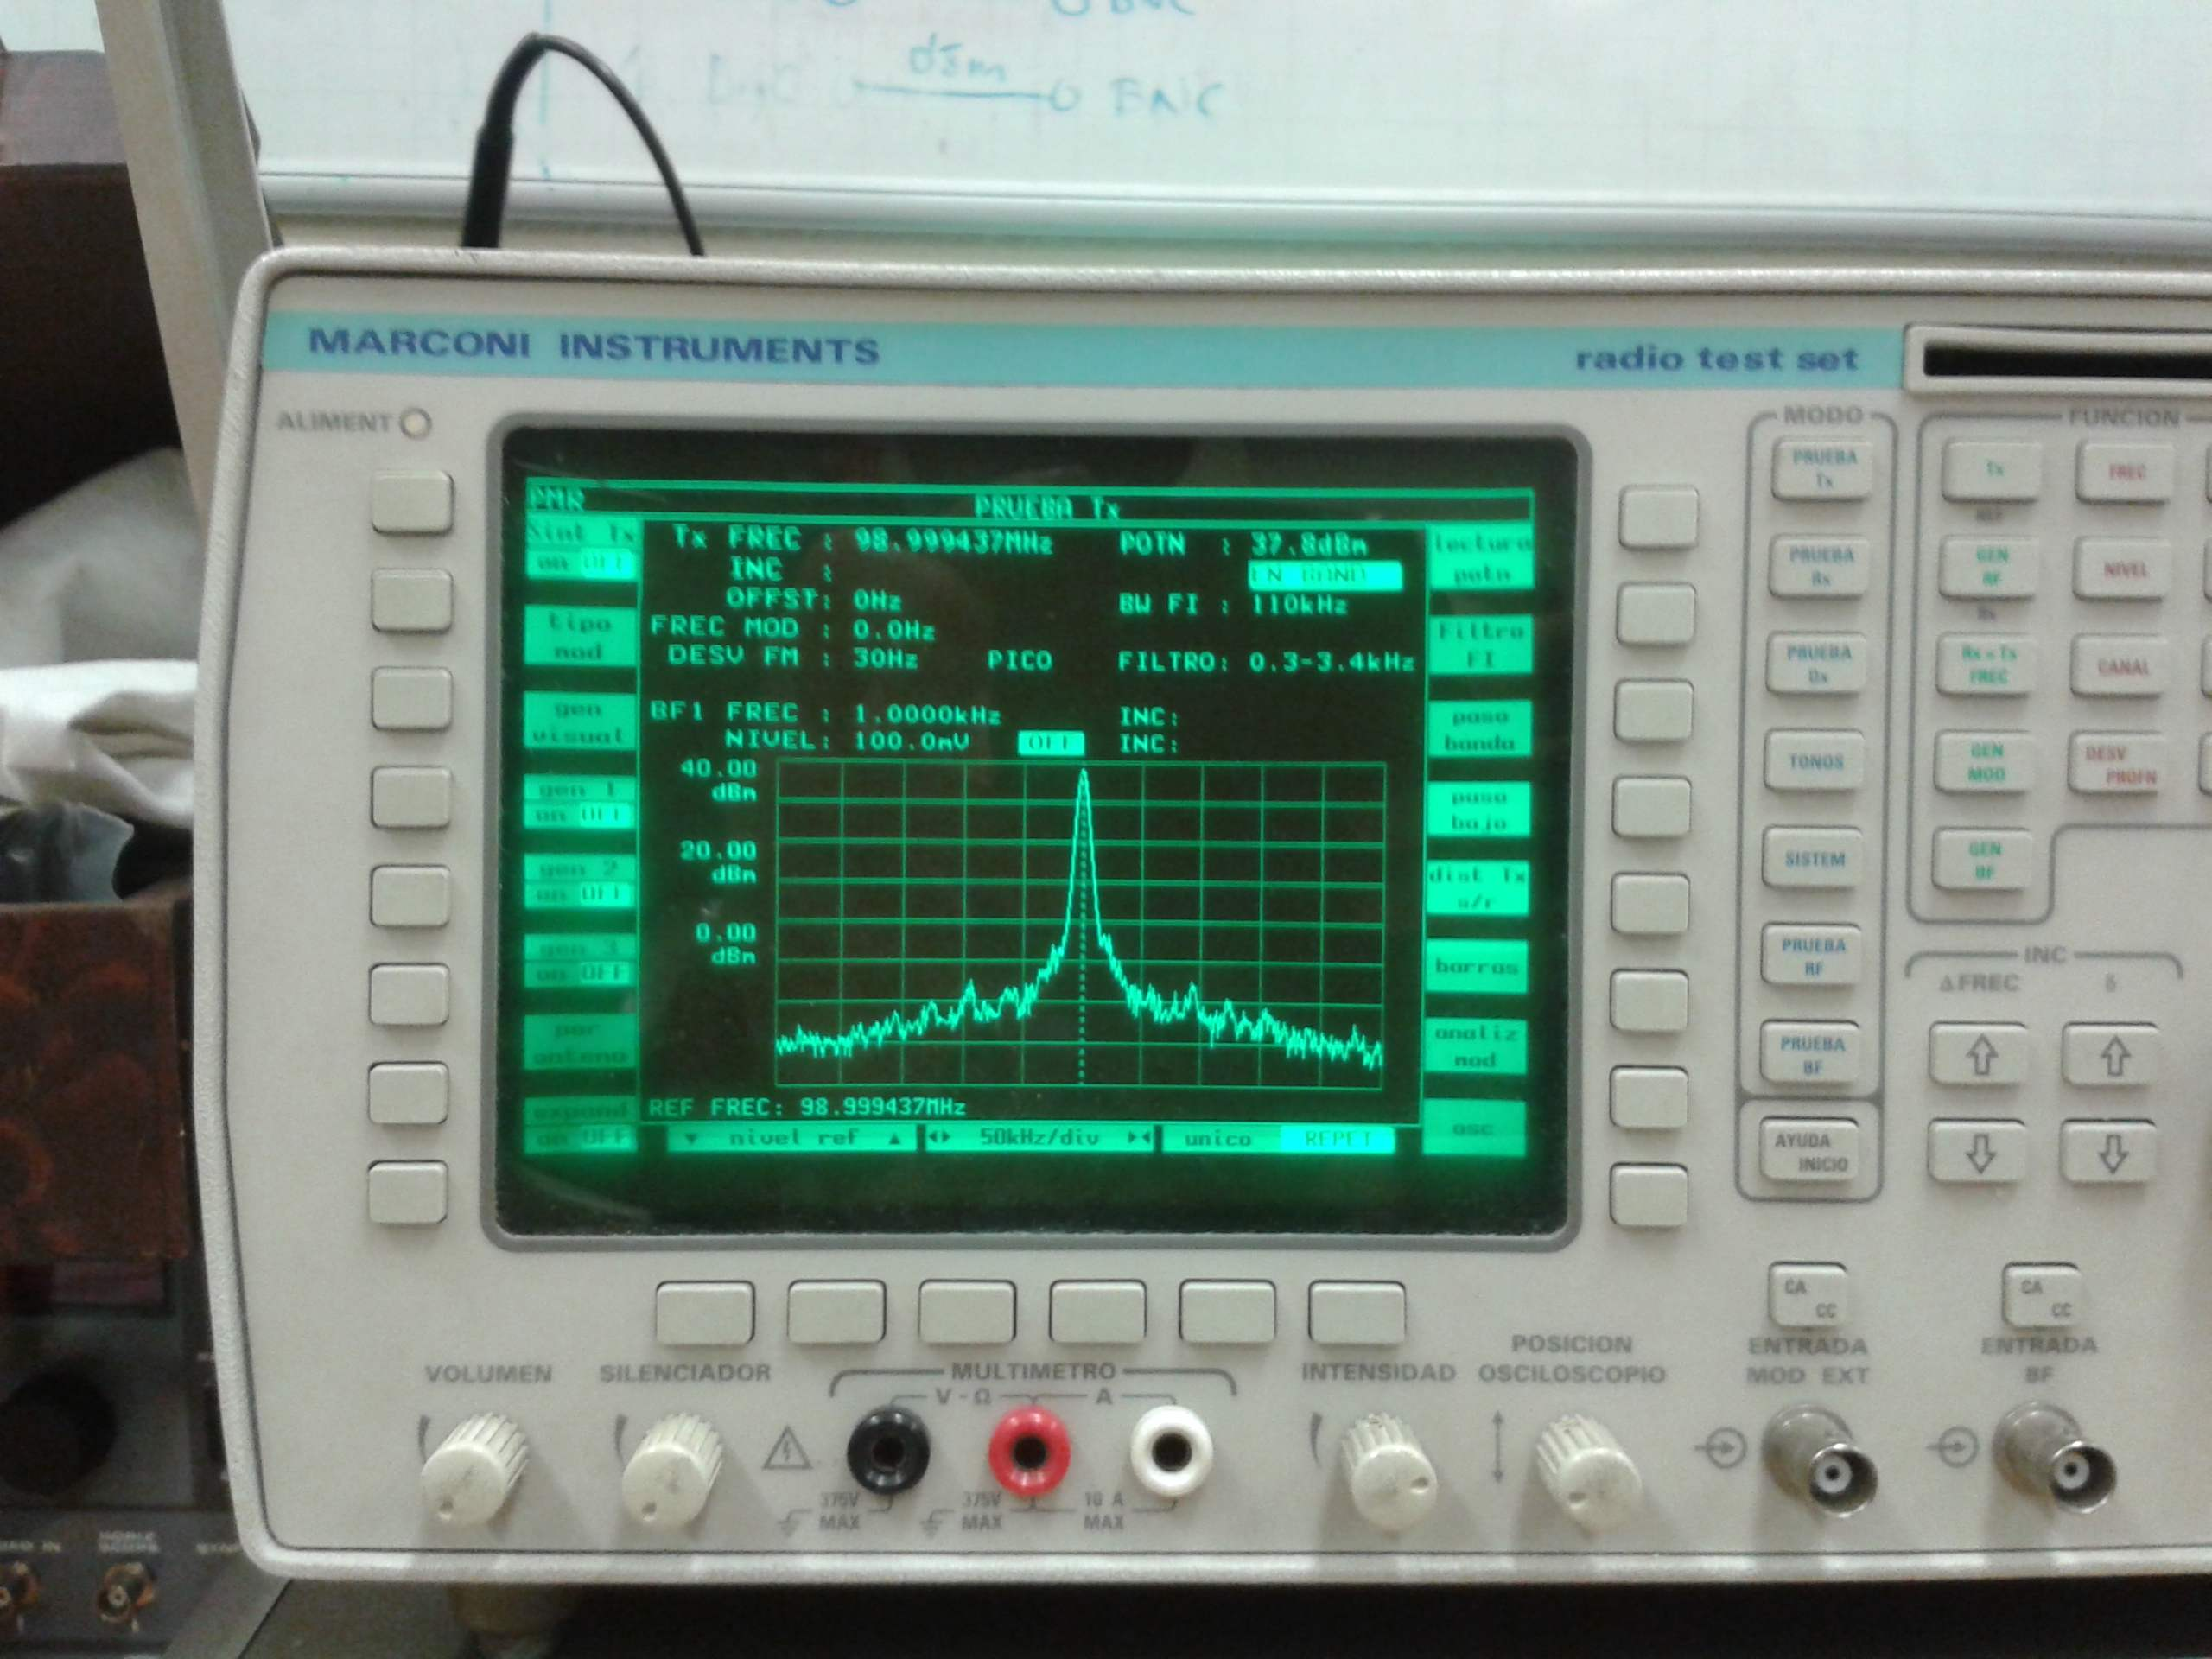 Visualización de portadora de radiofrecuencia en un analizador de espectros